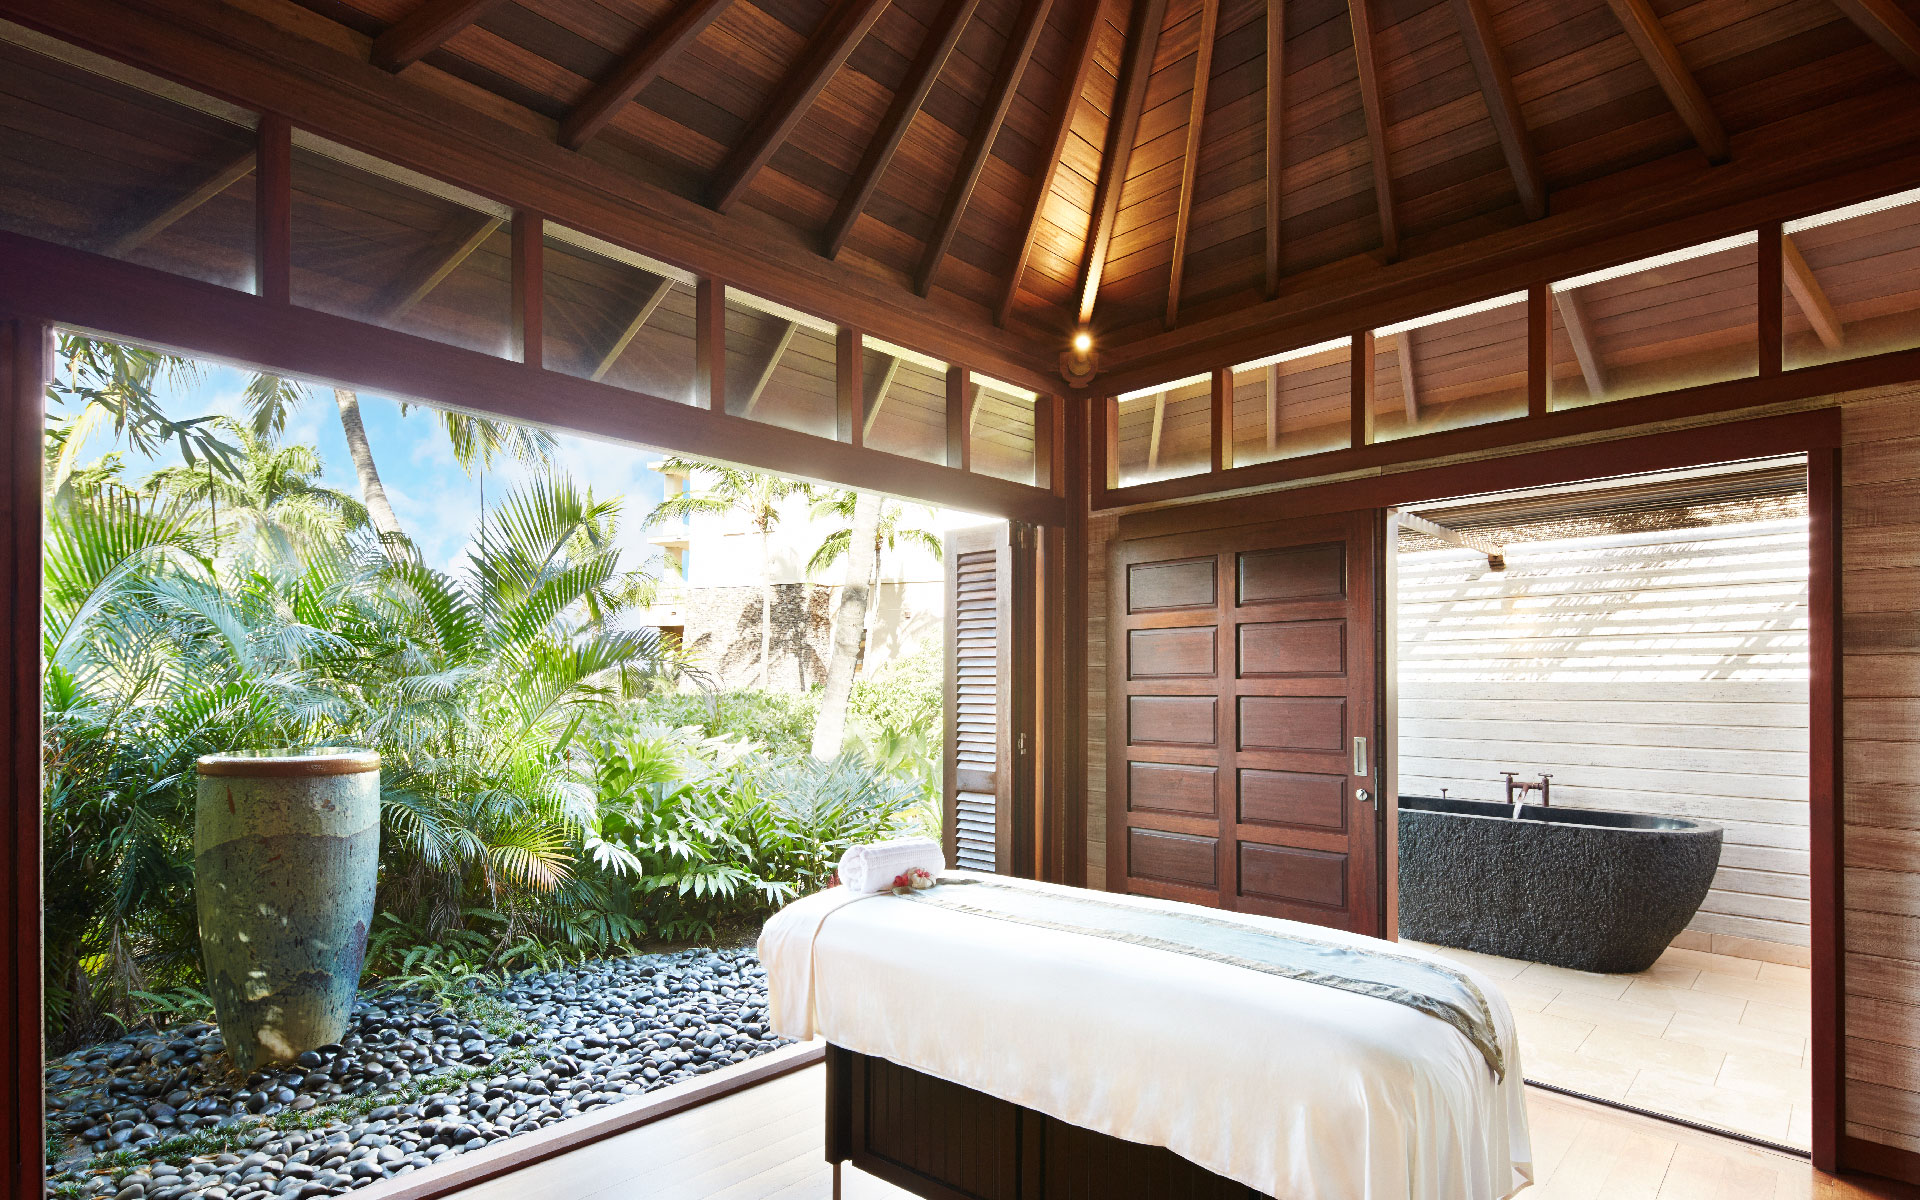 Massage spa room at The Spa at Montage Kapalua Bay in Hawaii